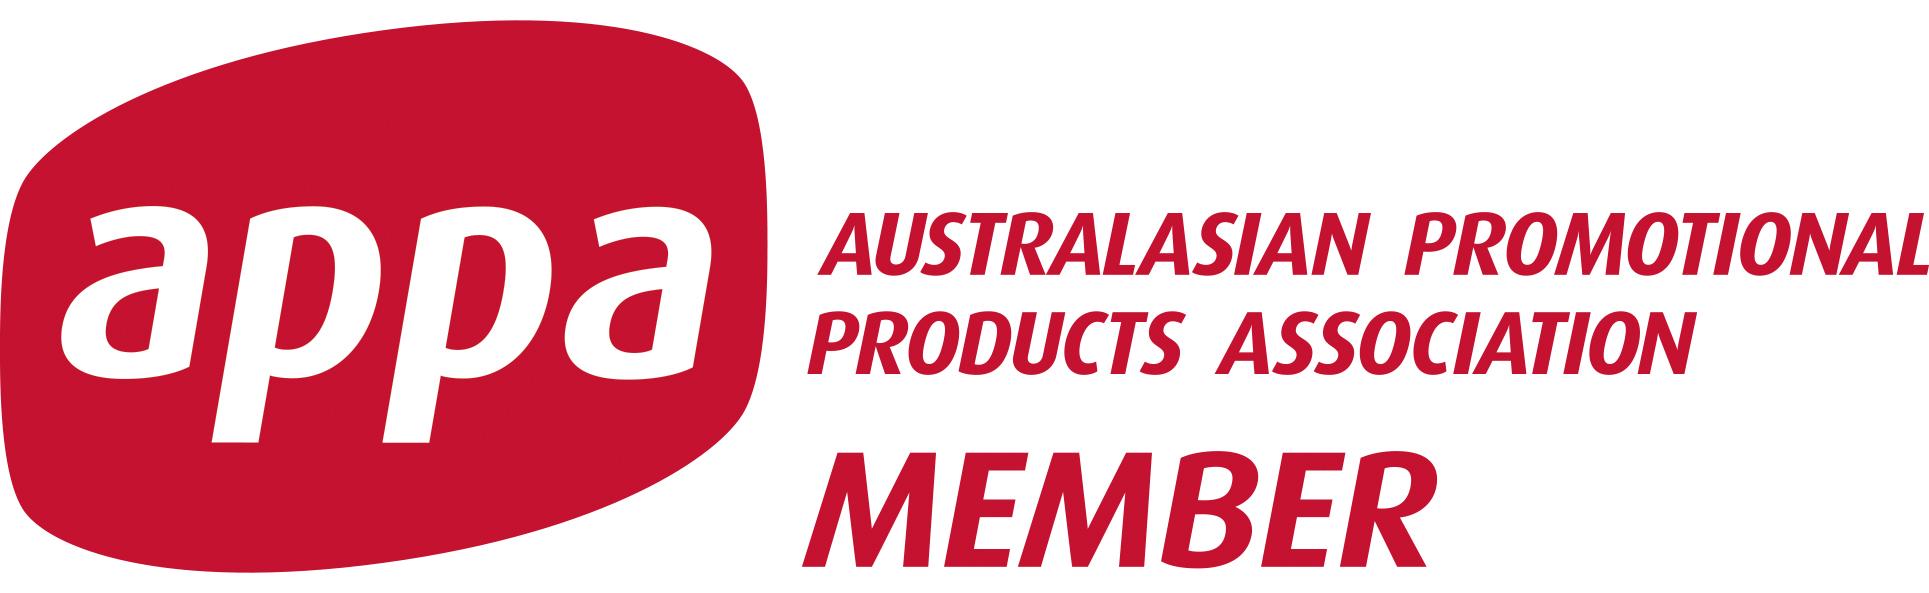 appa_04-8-logo_member_rgb